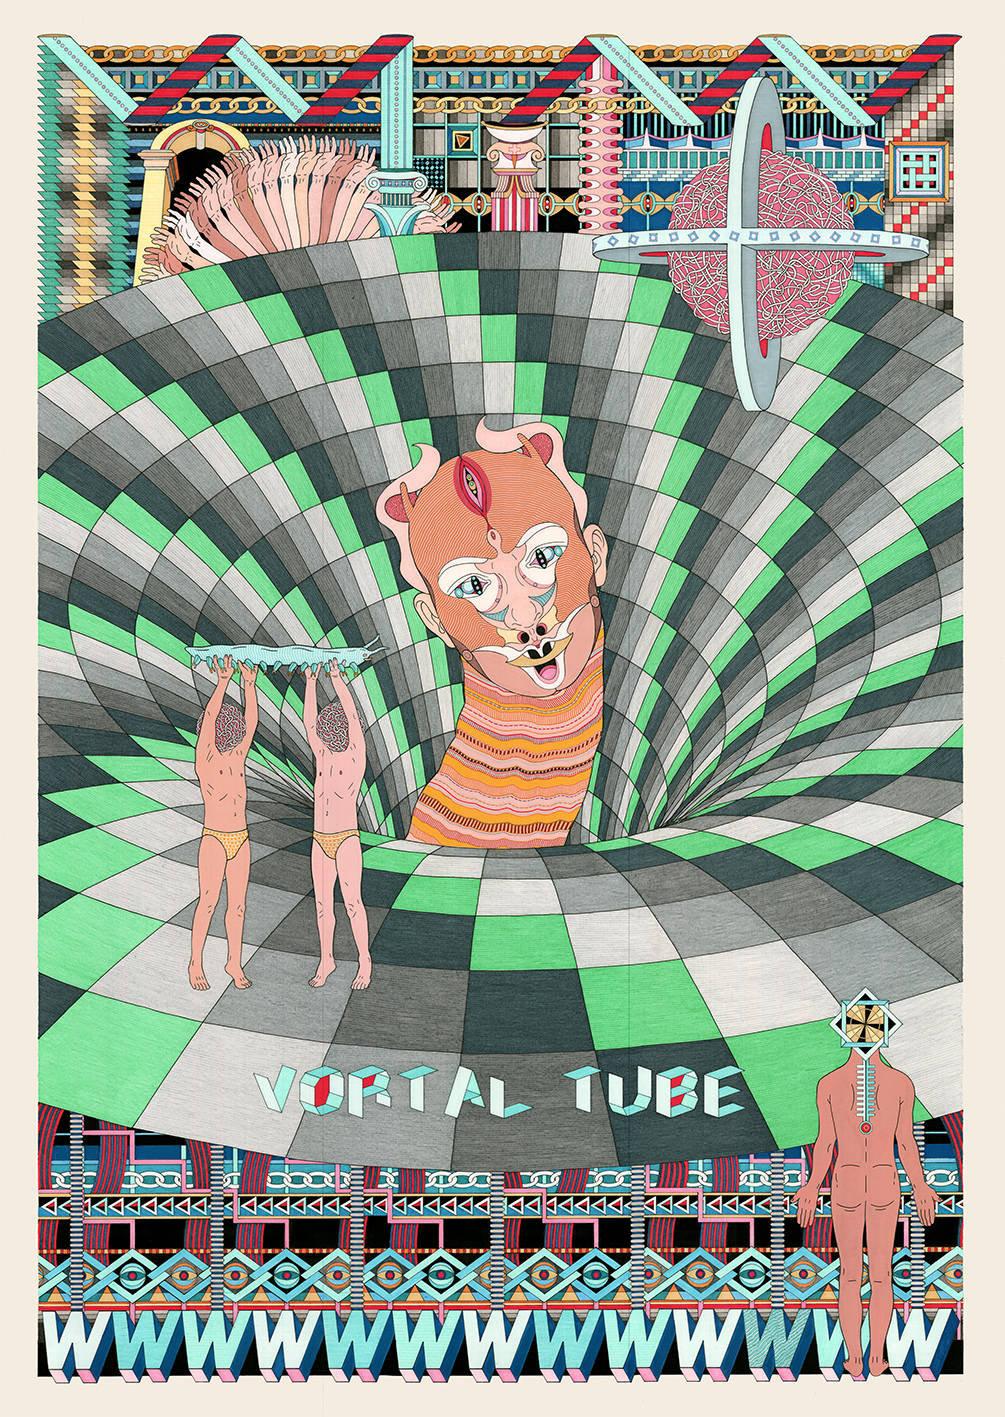 Vortal Tube, 2017